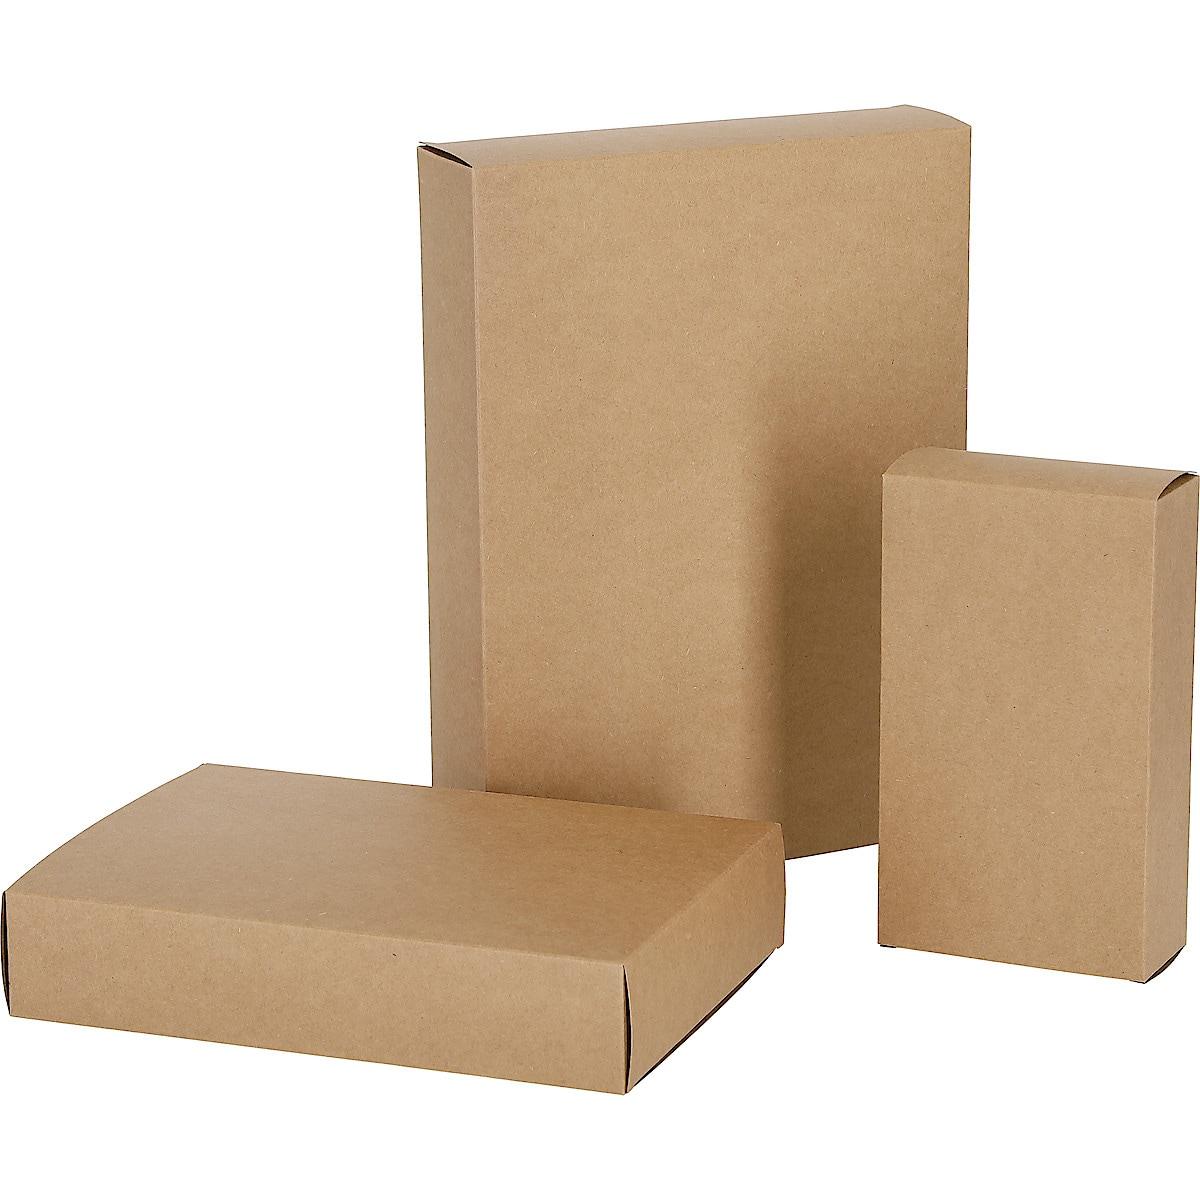 Lahjalaatikko 3 kpl ruskea